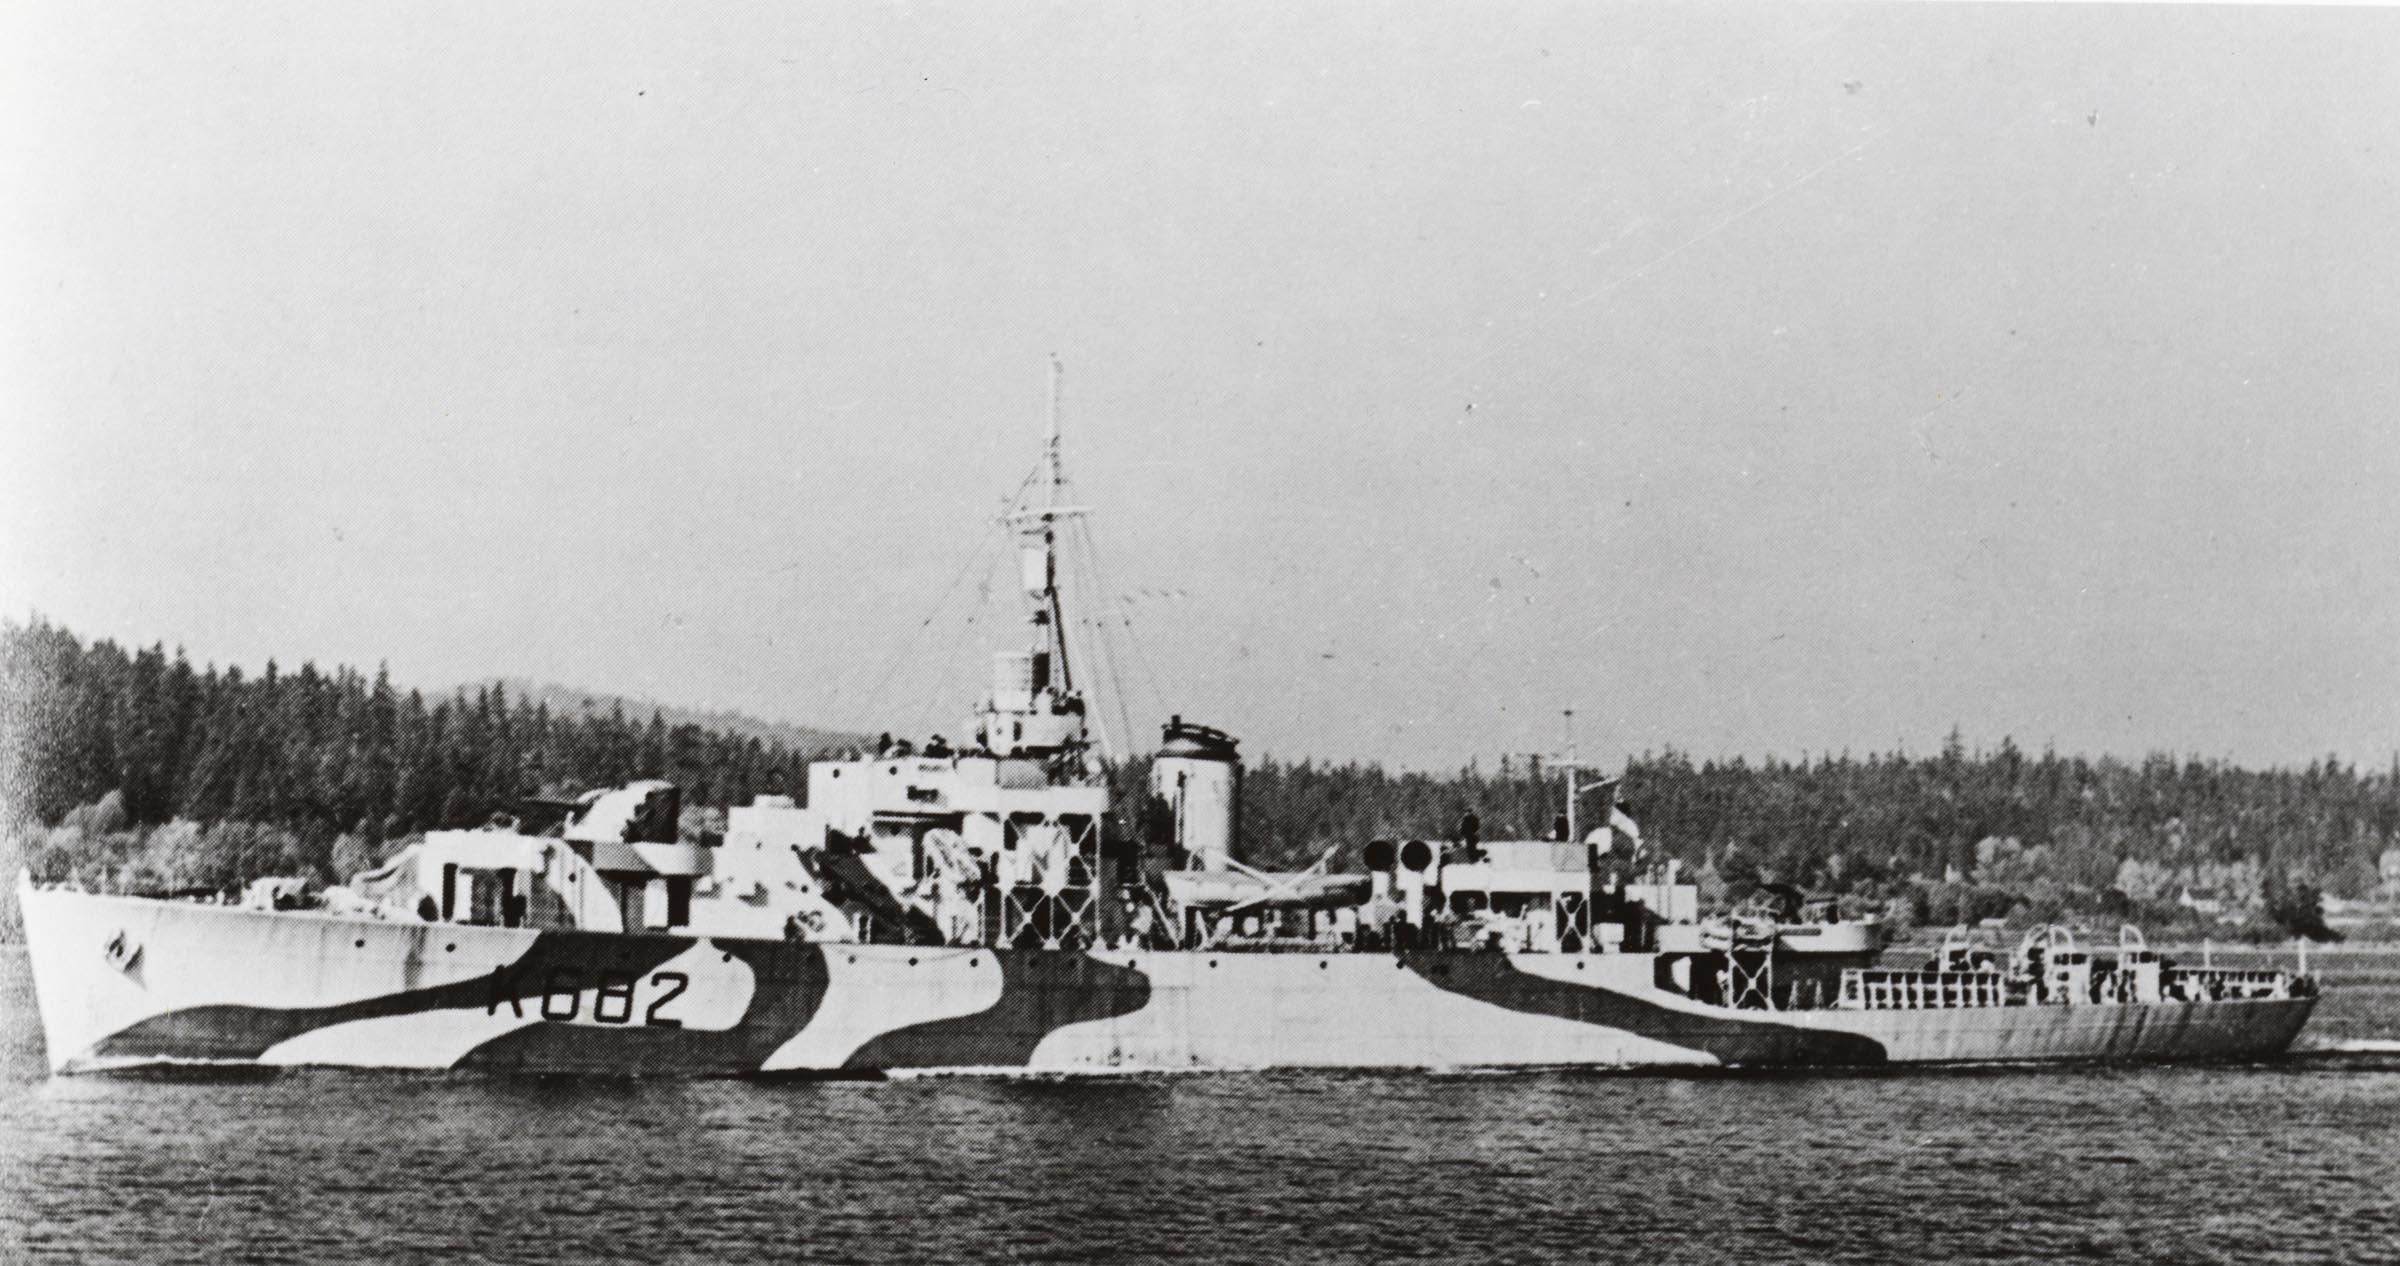 HMCS STRATHADAM